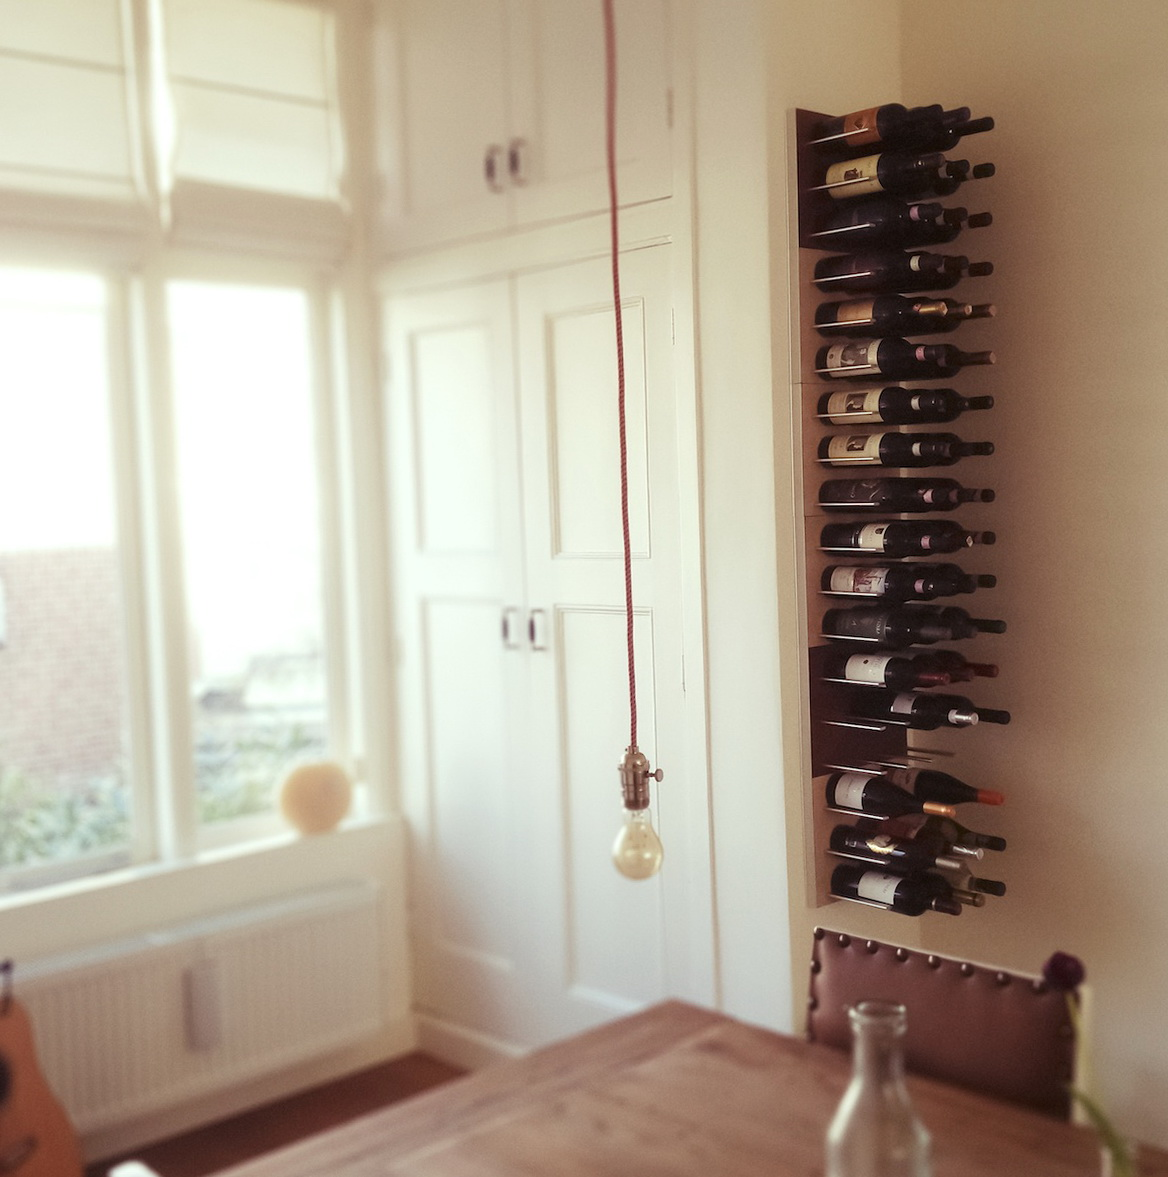 Permalink to Wine Cellar Racks Ikea